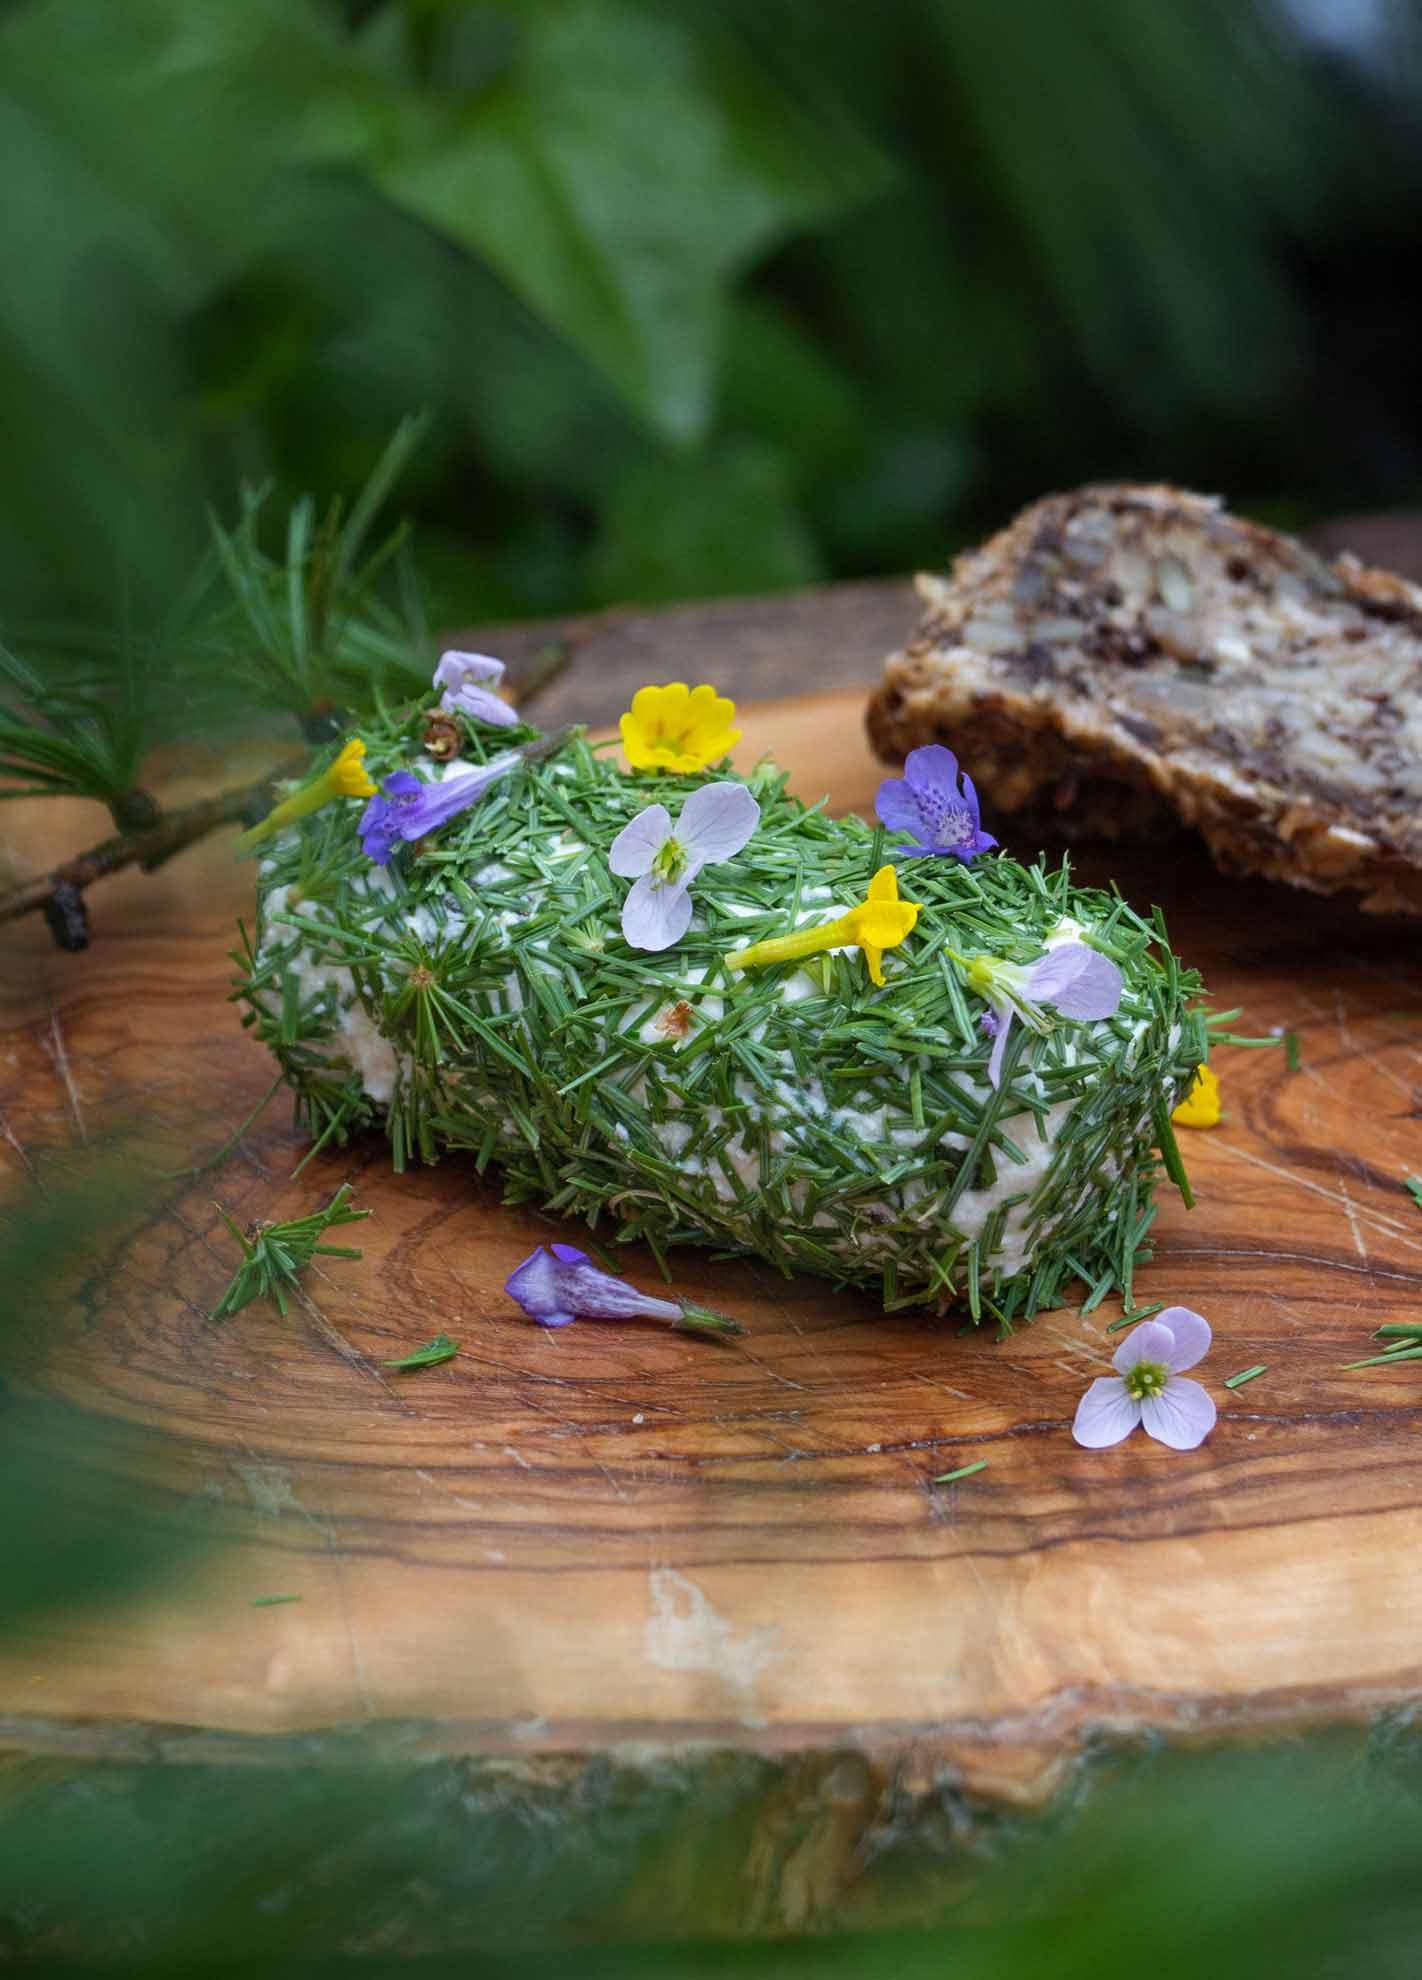 Ich ess' Bäume herbal Hunter Kräuterblog Baumküche Lärchen-Frischkäserolle